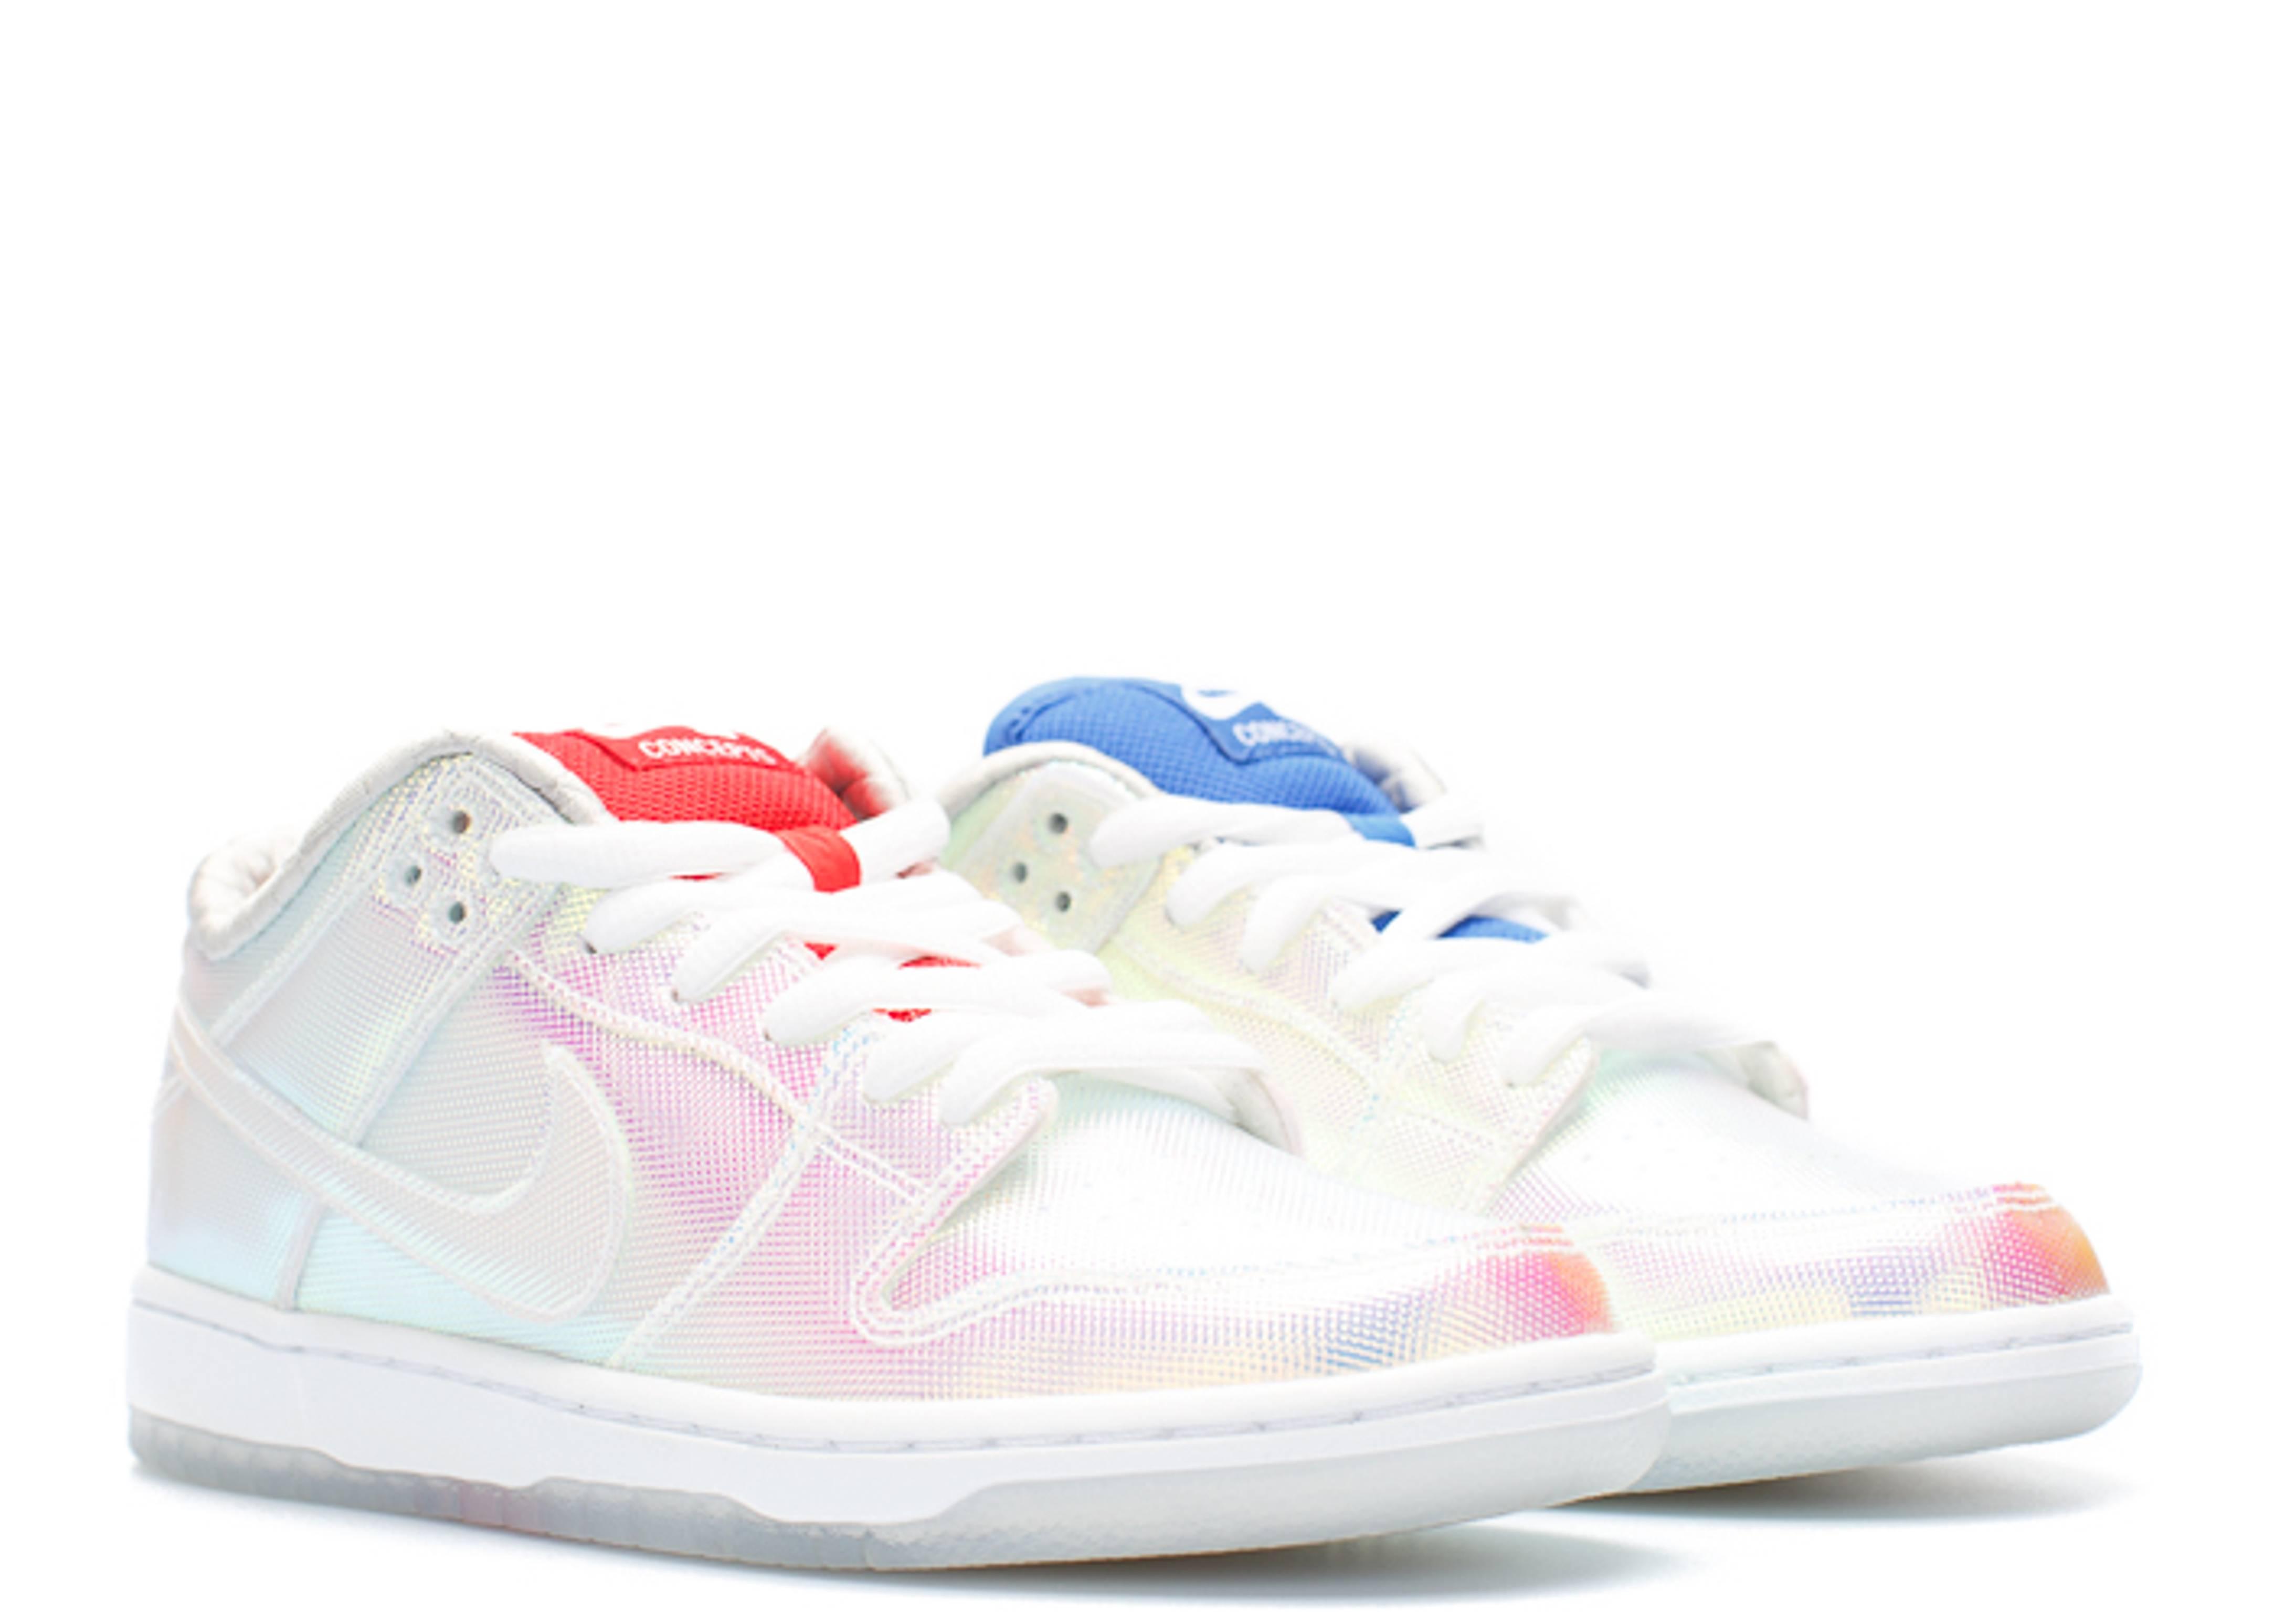 cf0908029992 Concepts Nike Sb Dunk Low